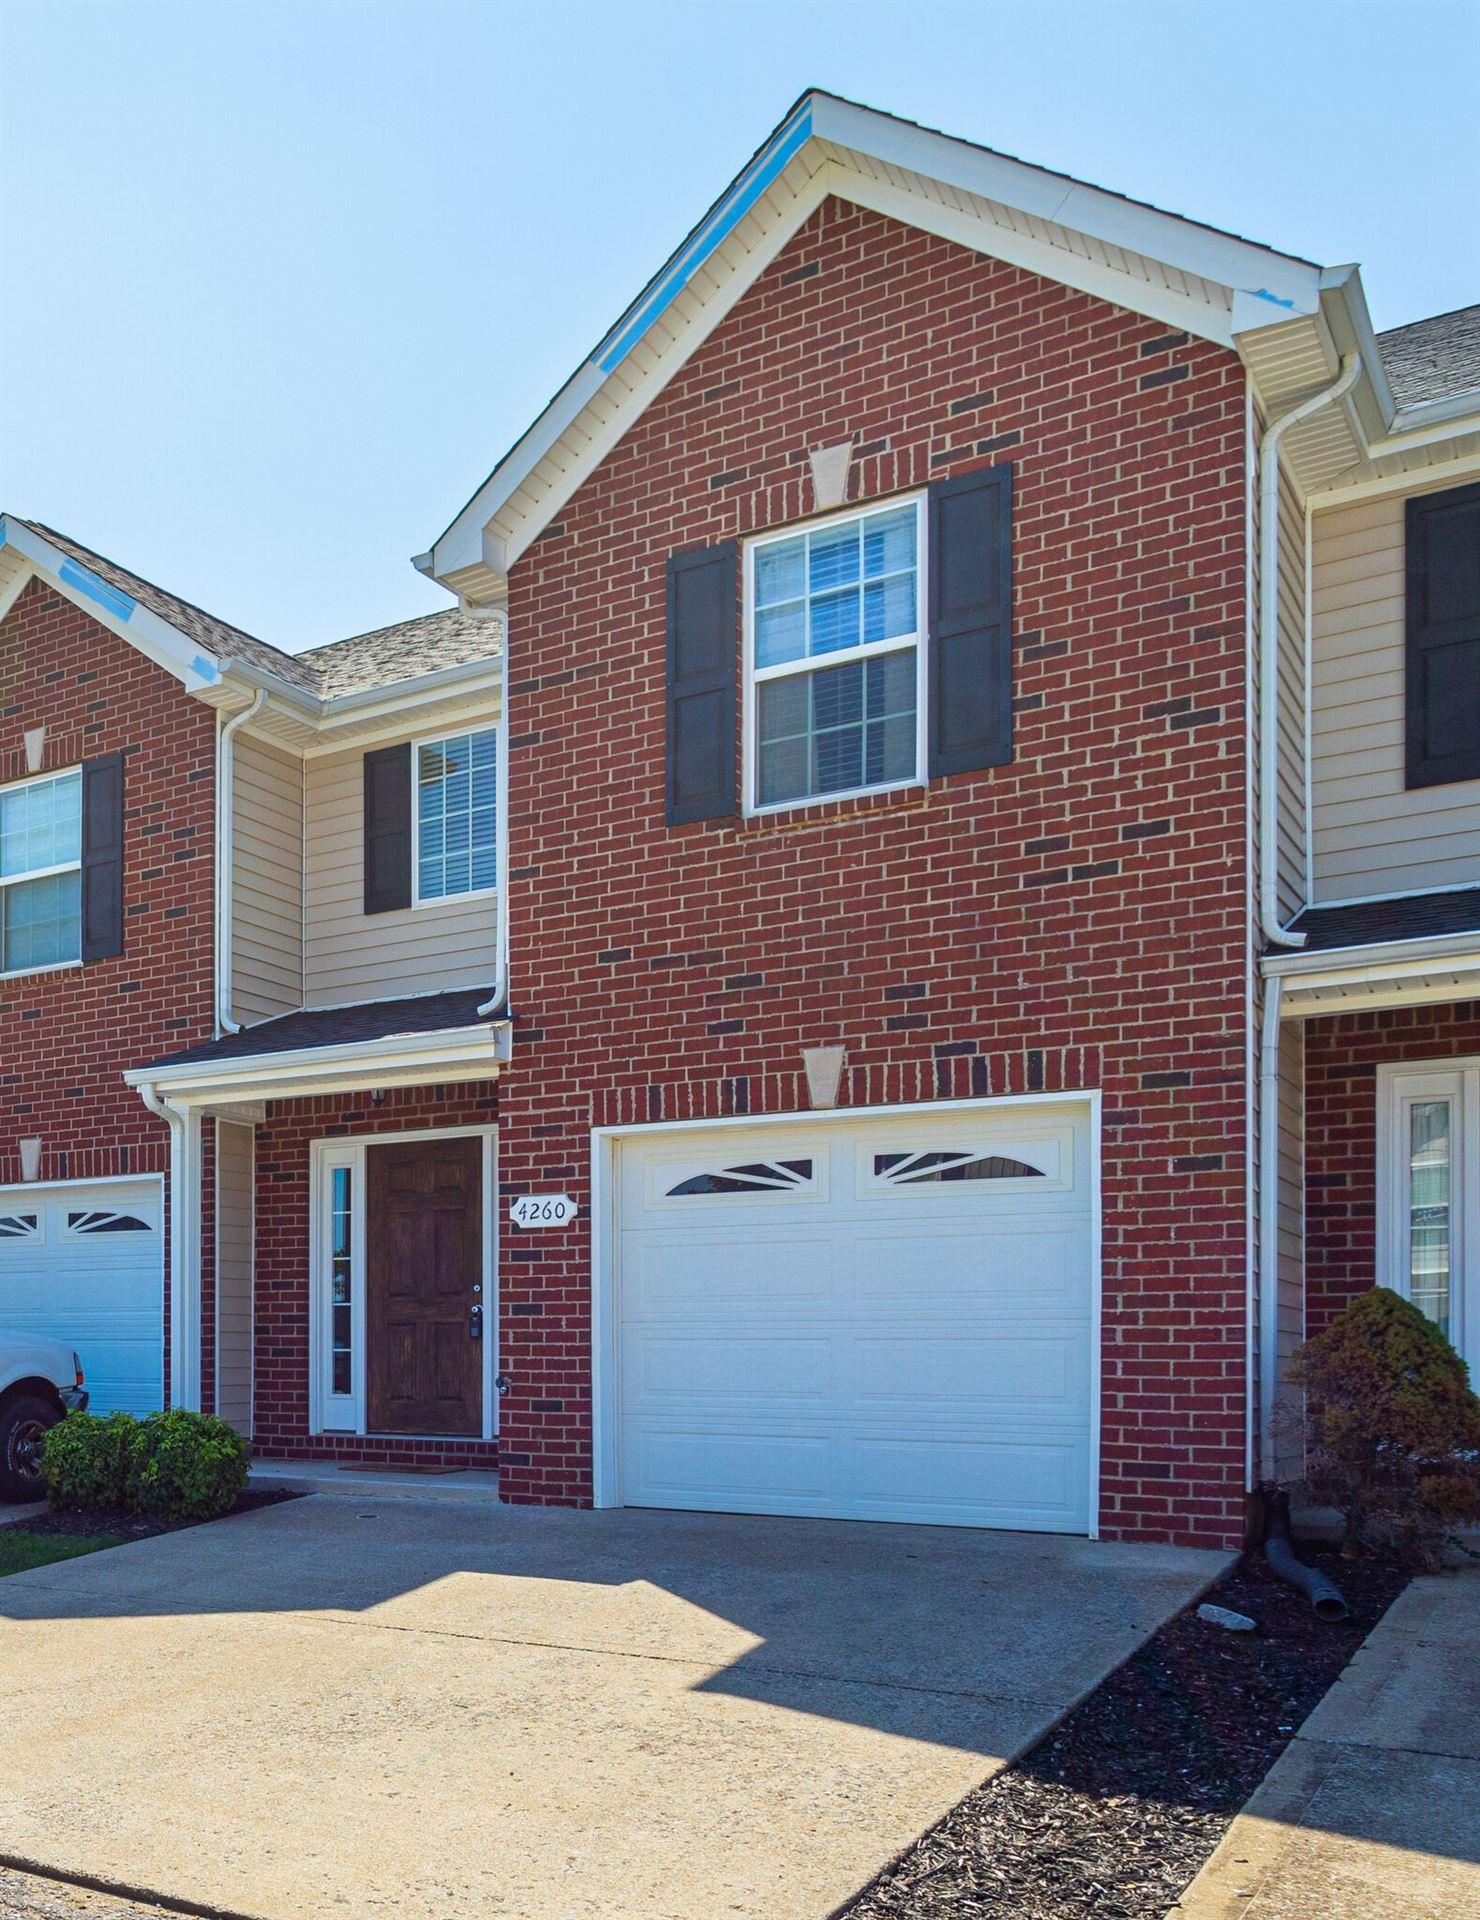 4260 Aurora Cir, Murfreesboro, TN 37127 - MLS#: 2288579